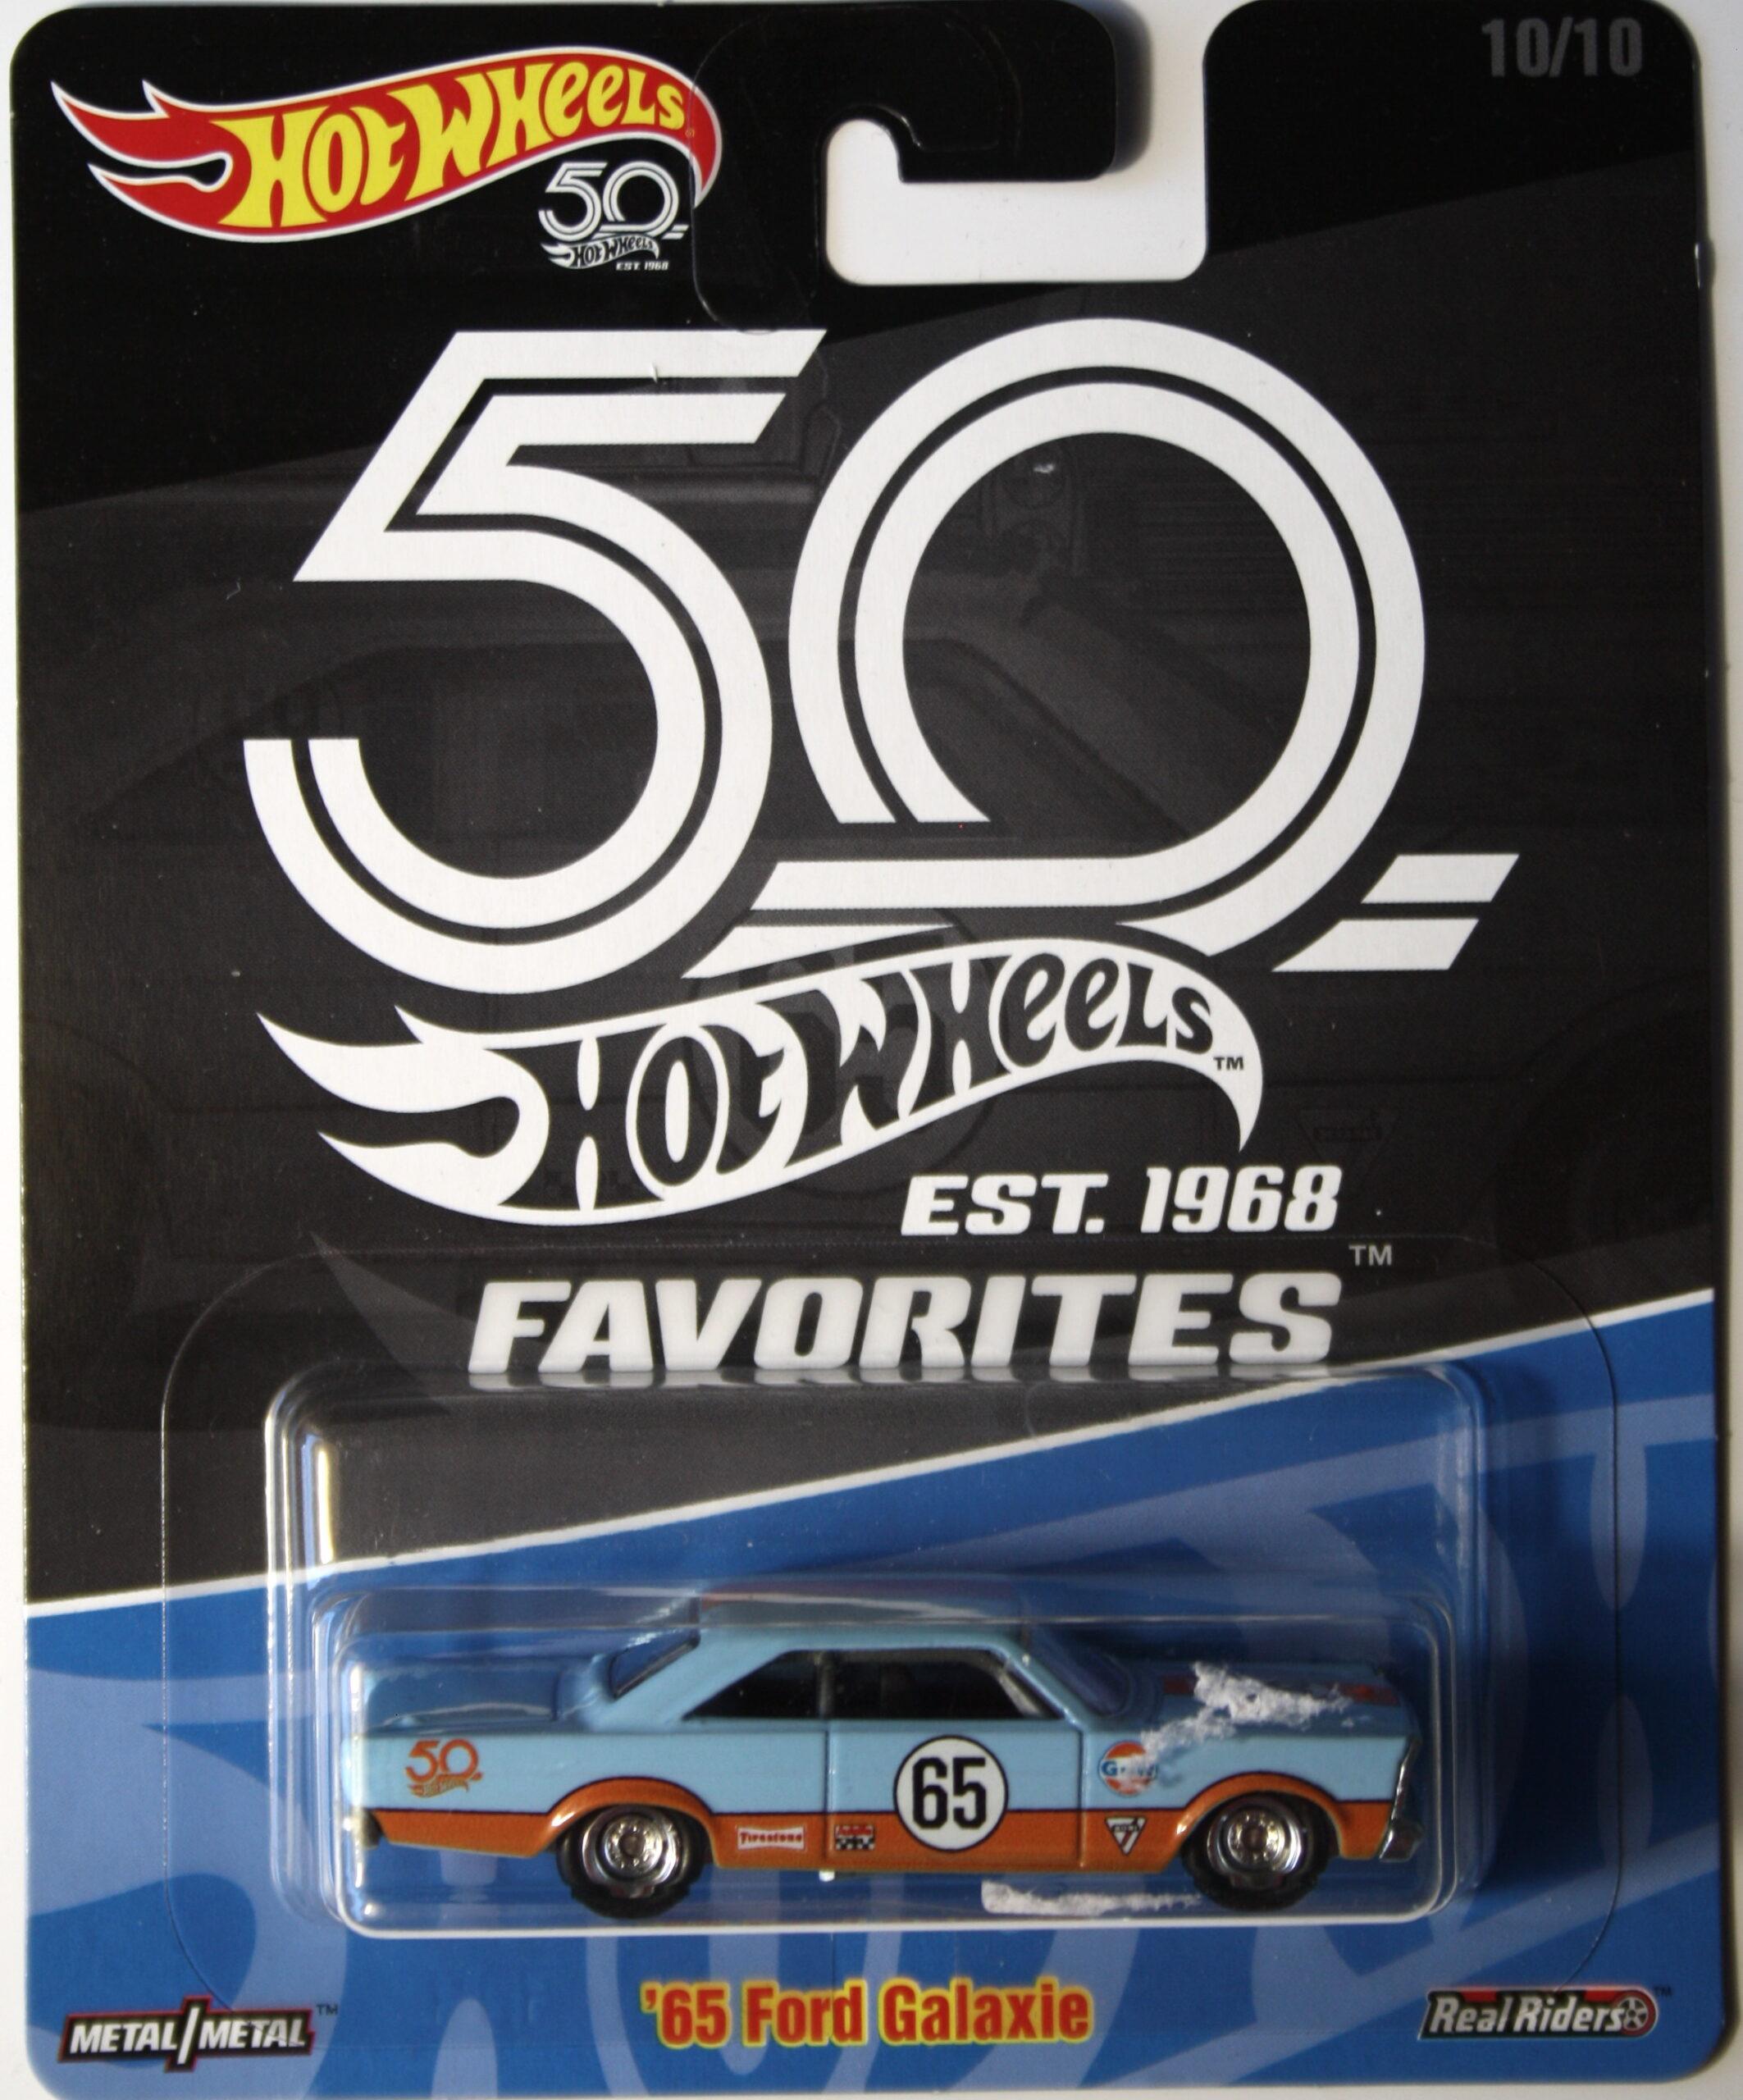 Hot Wheels Ford 1965 Galaxy Gulf Real Riders